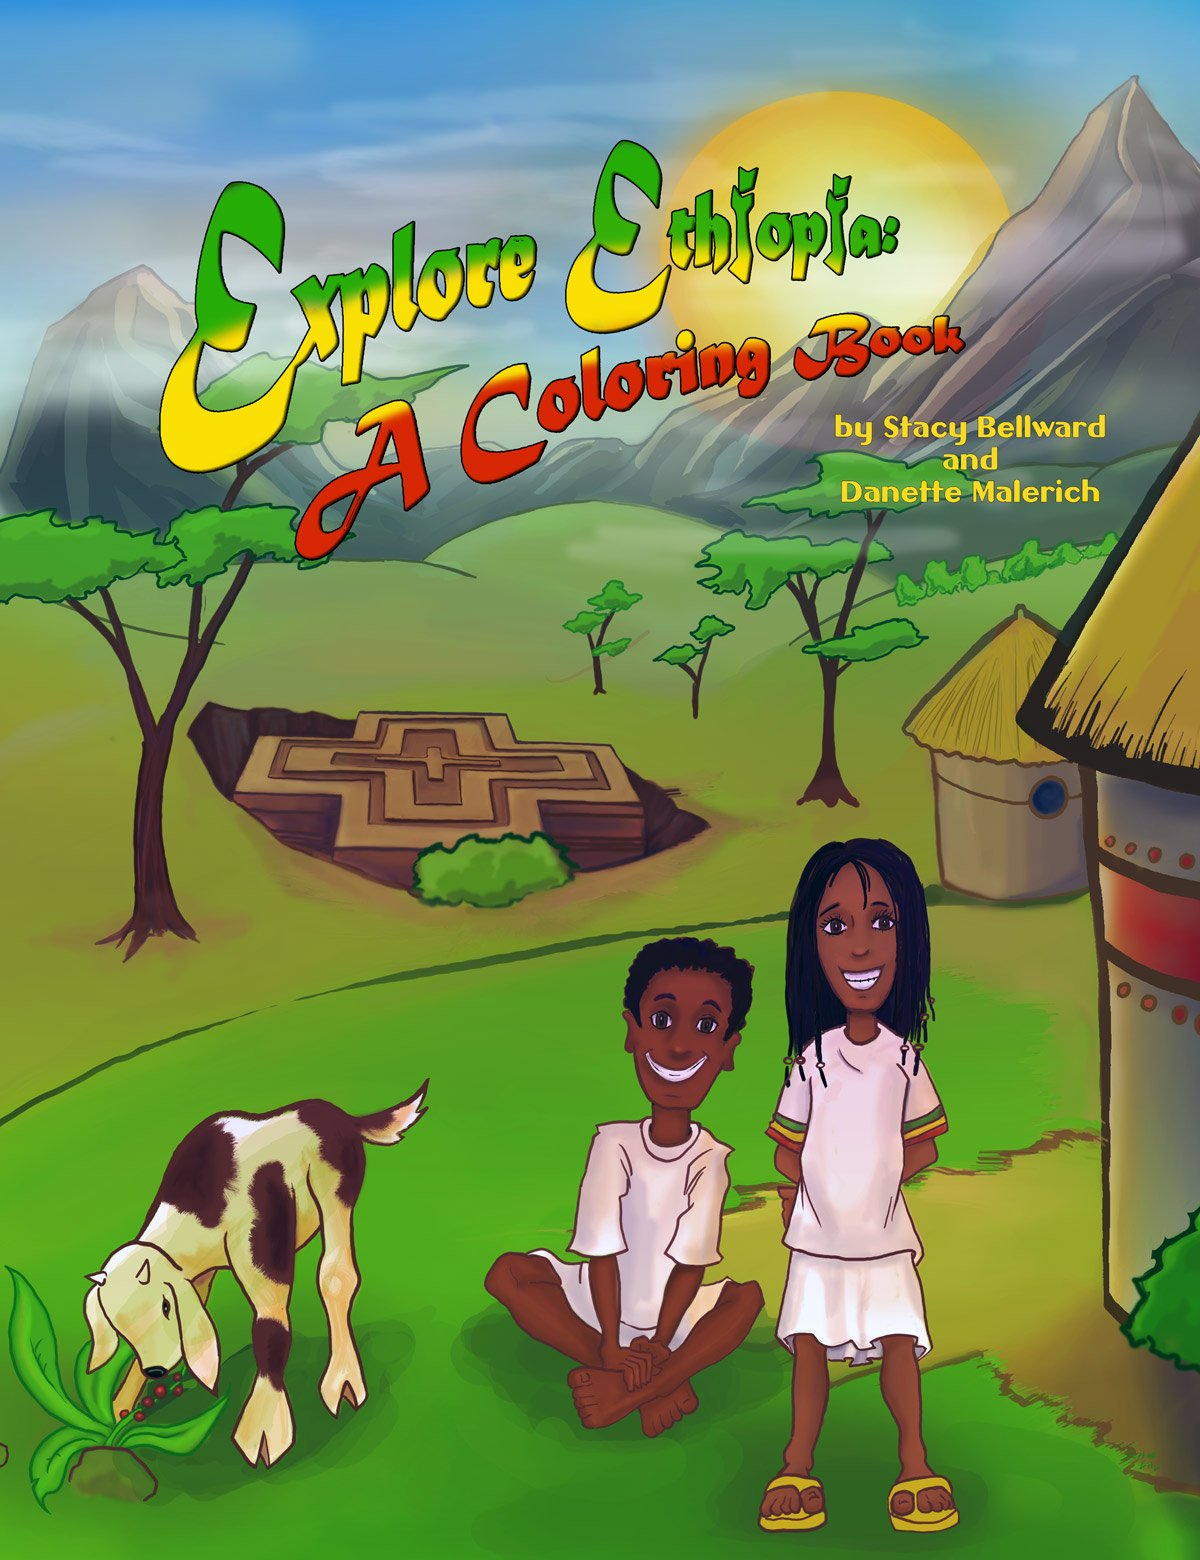 explore ethiopia a coloring book stacy bellward danette malerich 9780979748127 amazoncom books